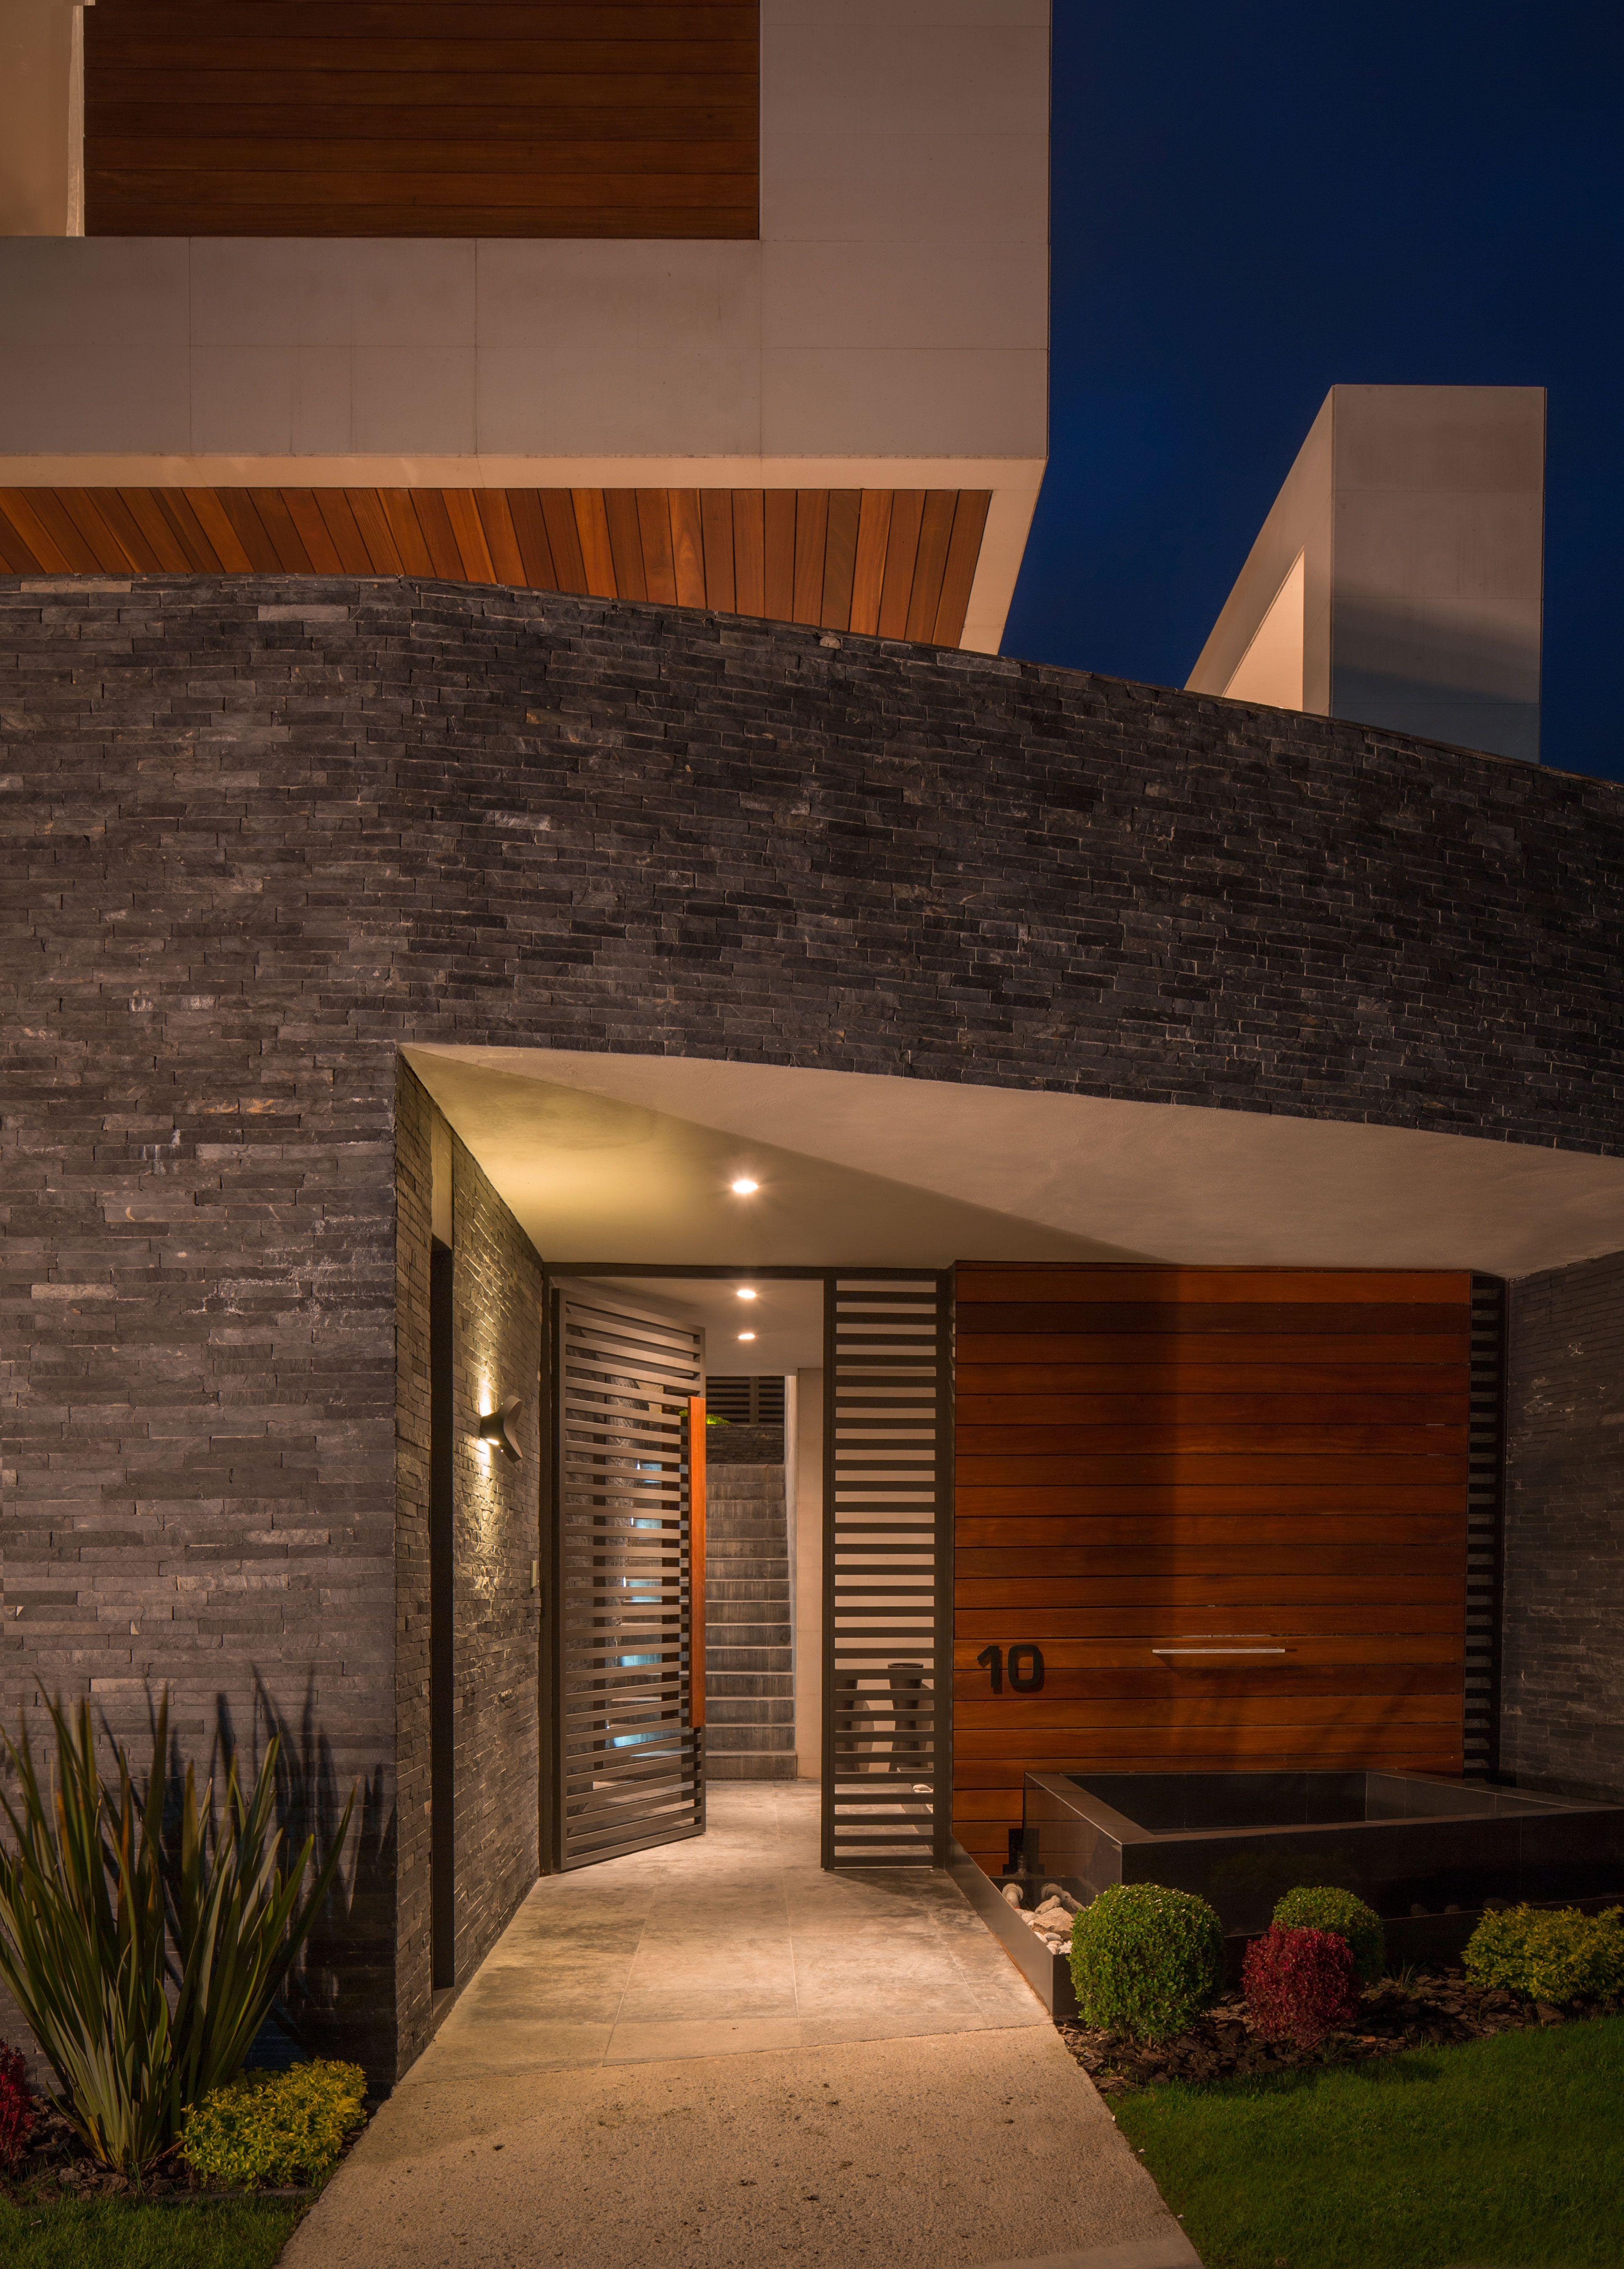 49 Most Popular Modern Dream House Exterior Design Ideas 3 In 2020: Pozas Arquitectos